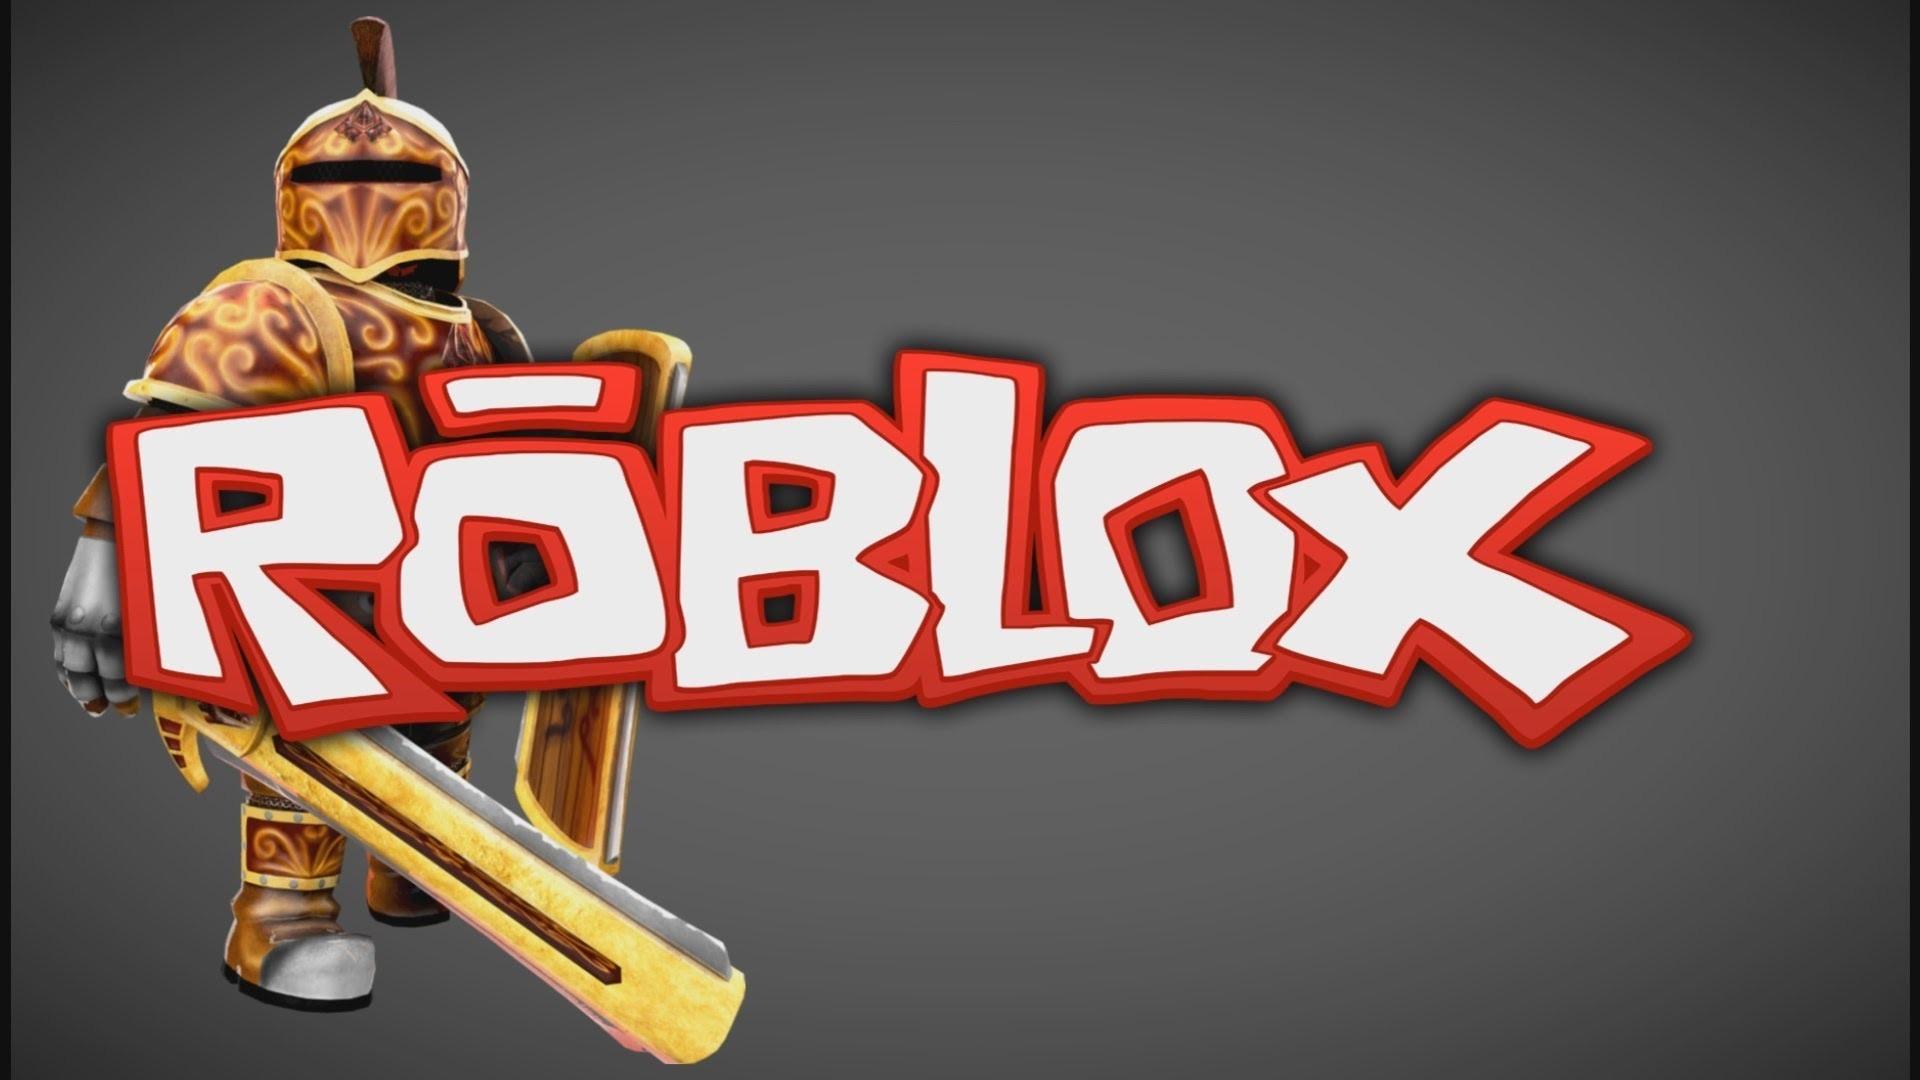 Roblox Wallpaper Hd Elegant Roblox Wallpapers 84 Images Roblox